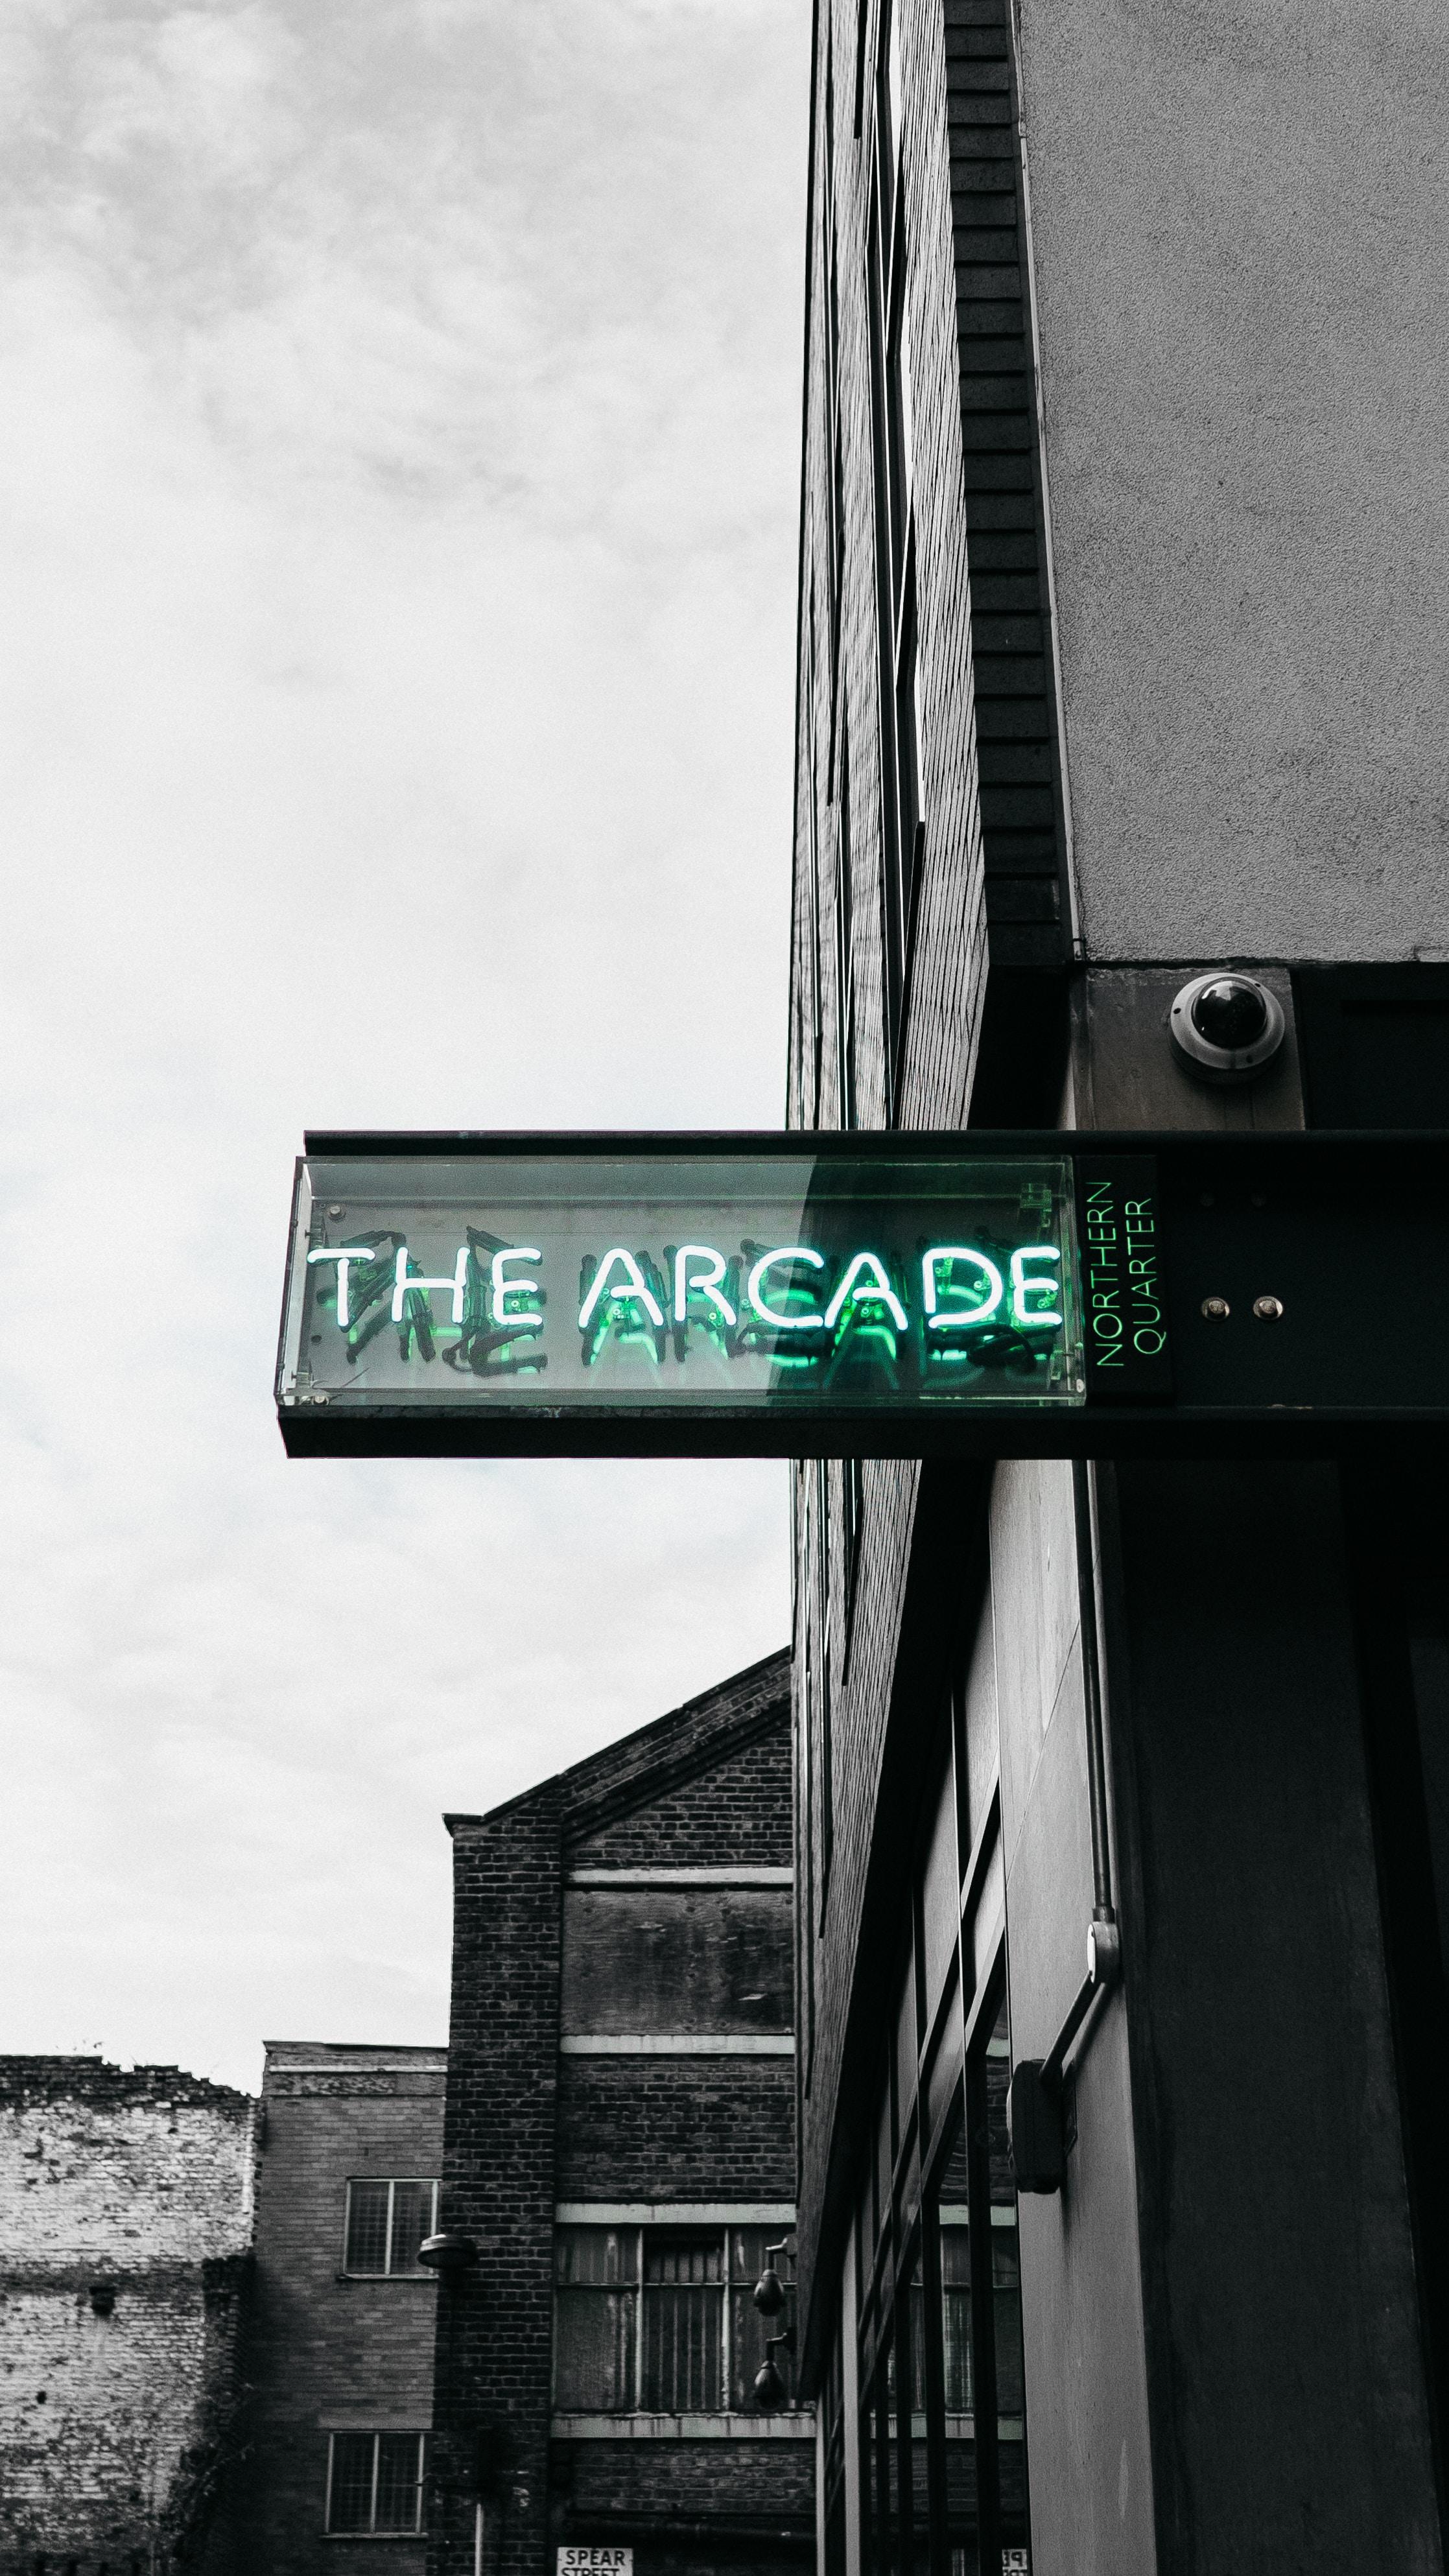 The Arcade signage